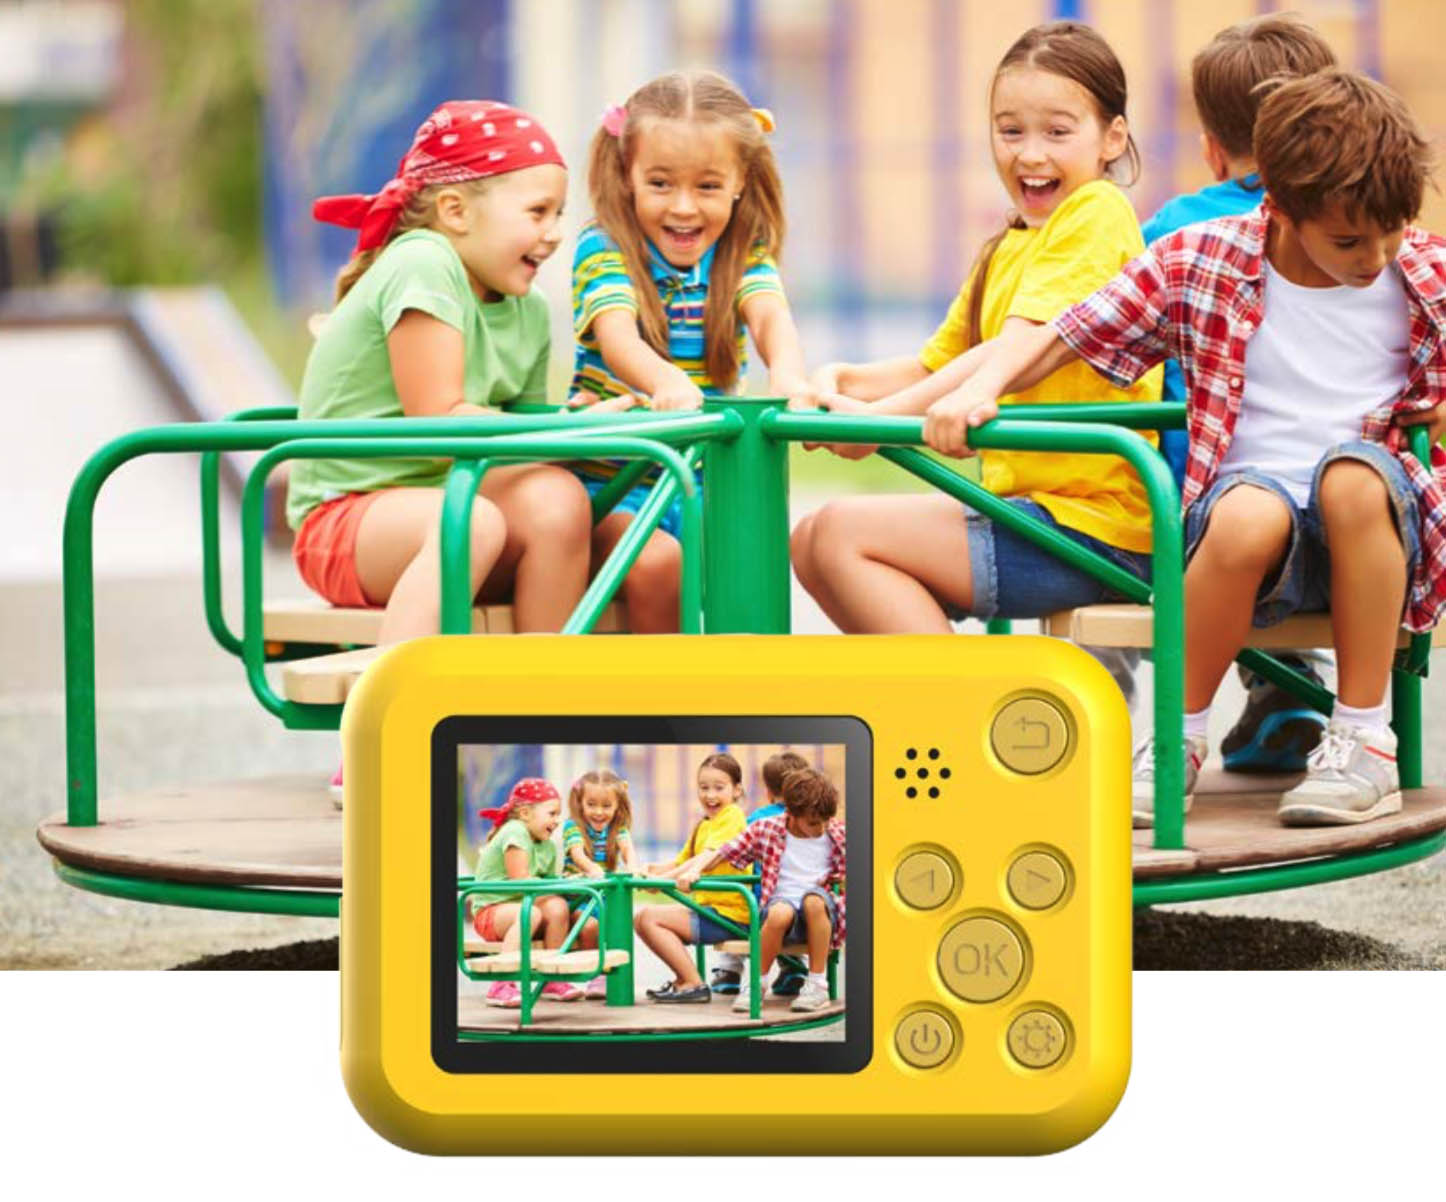 funcam-kids-hd-camera-features-3